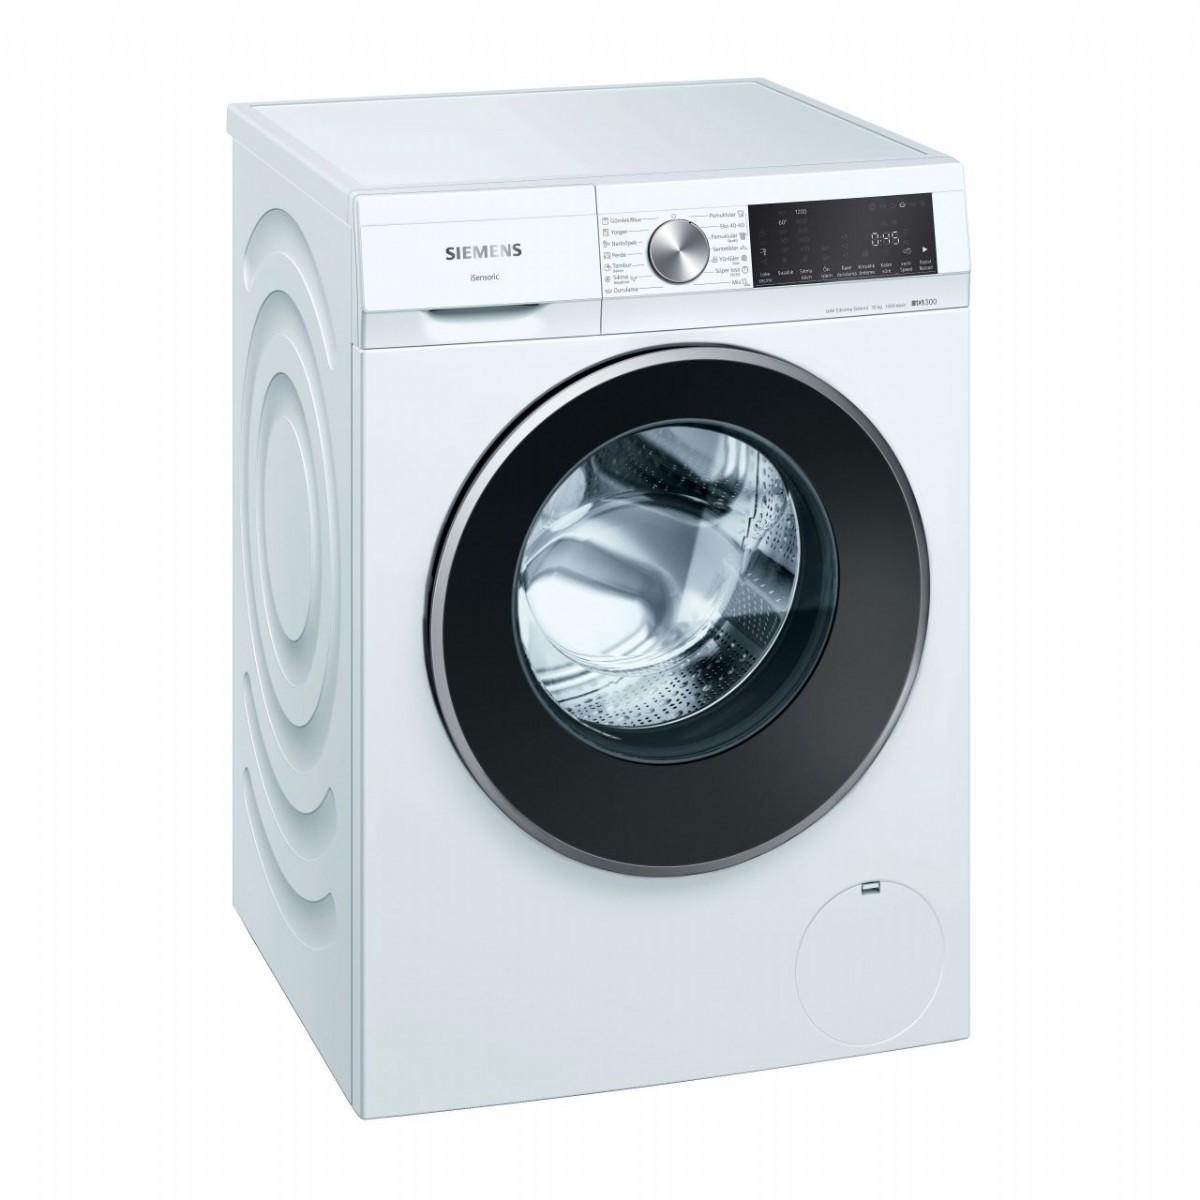 Siemens WG52A2X0TR A+++ 1200 Devir 10 kg Çamaşır Makinesi   Çamaşır Makinesi